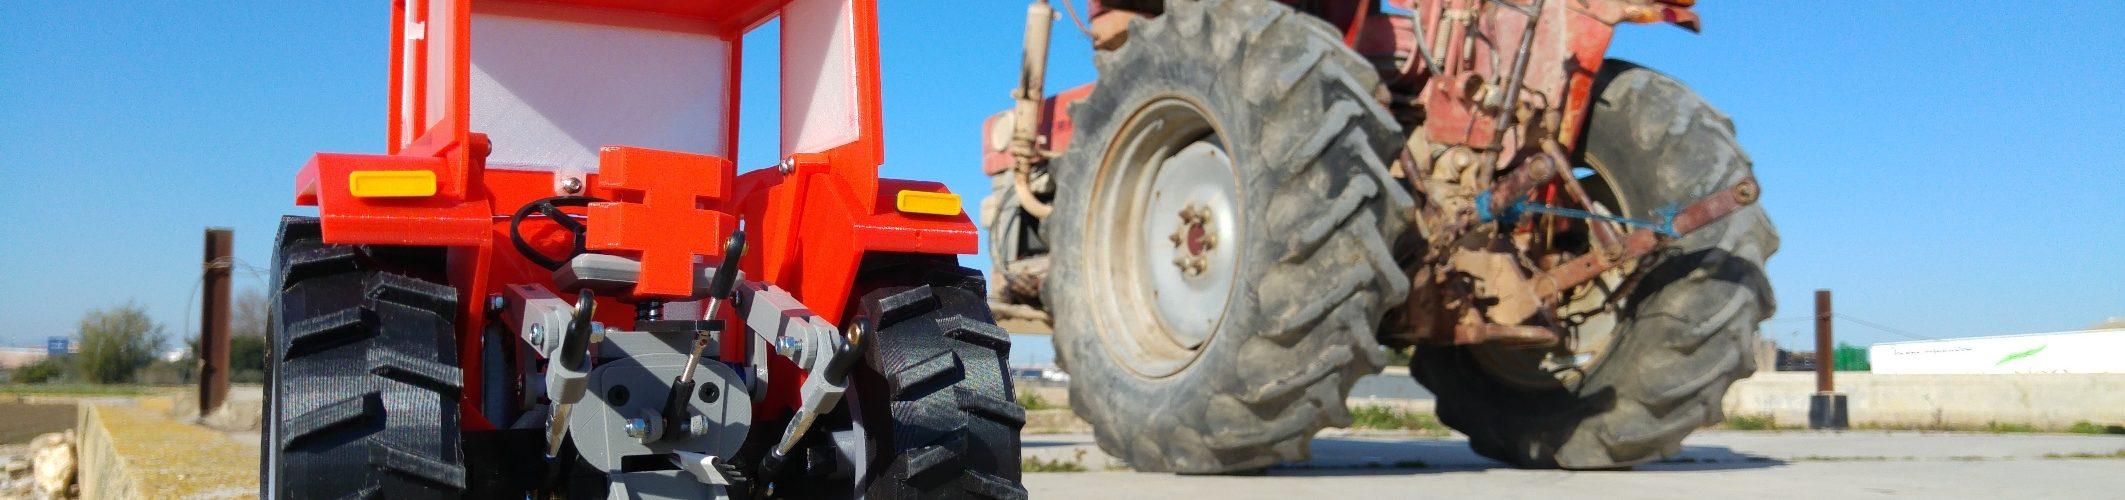 OpenRC_Tractor_cabin_release_rear